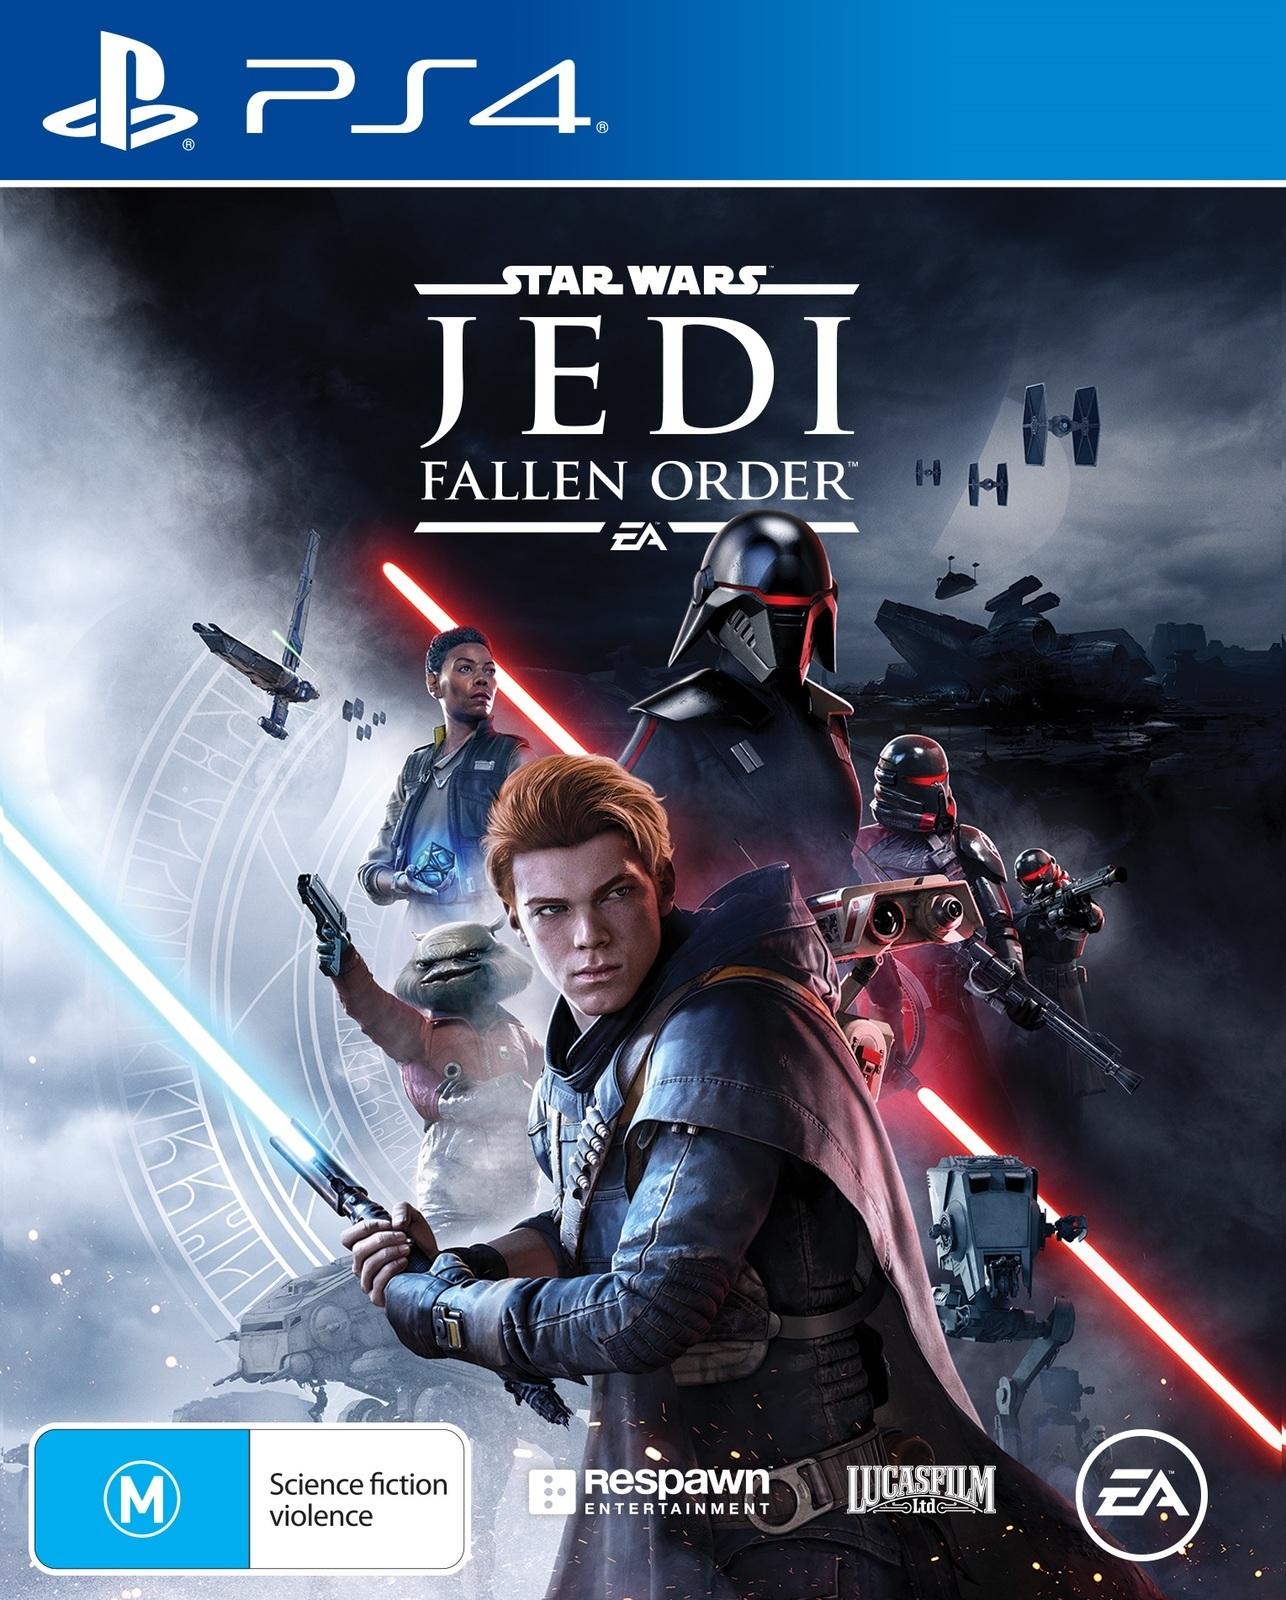 Star Wars Jedi: Fallen Order for PS4 image